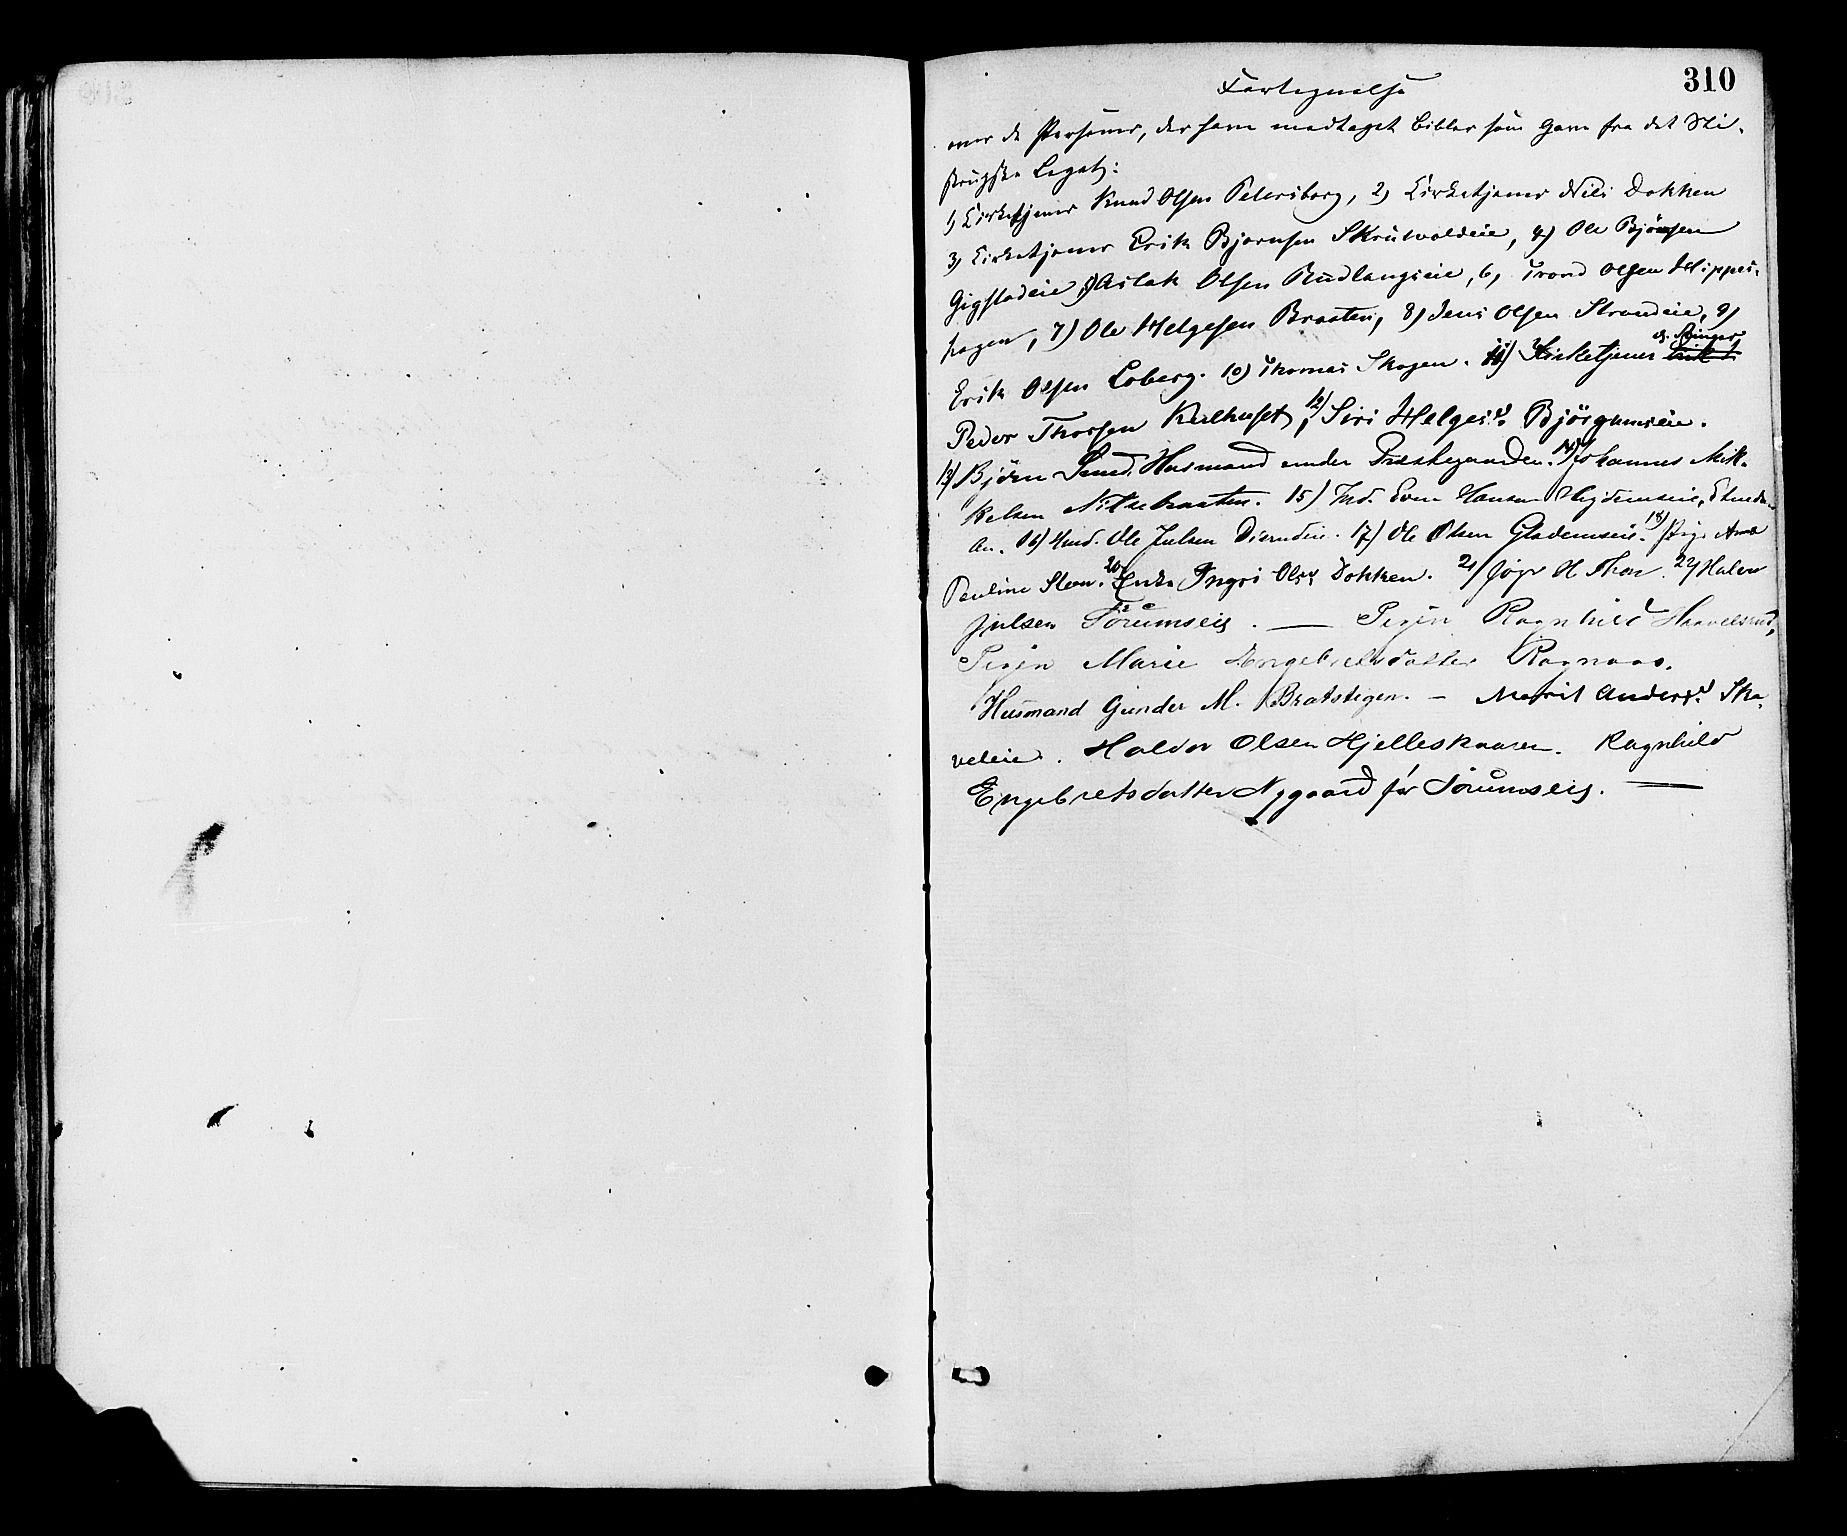 SAH, Nord-Aurdal prestekontor, Ministerialbok nr. 9, 1876-1882, s. 310